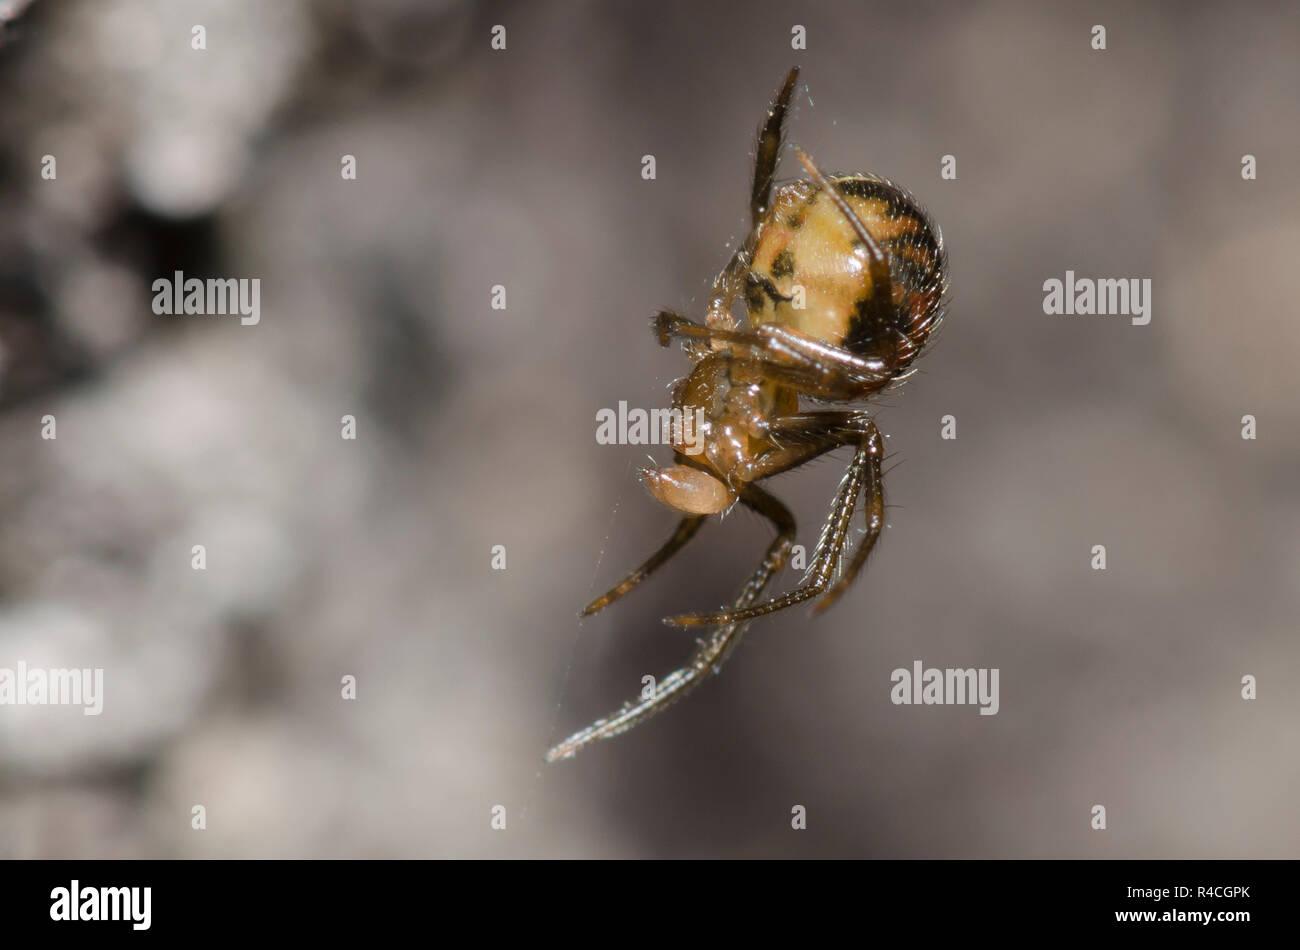 Cobweb Spider, Family Theridiidae, male - Stock Image